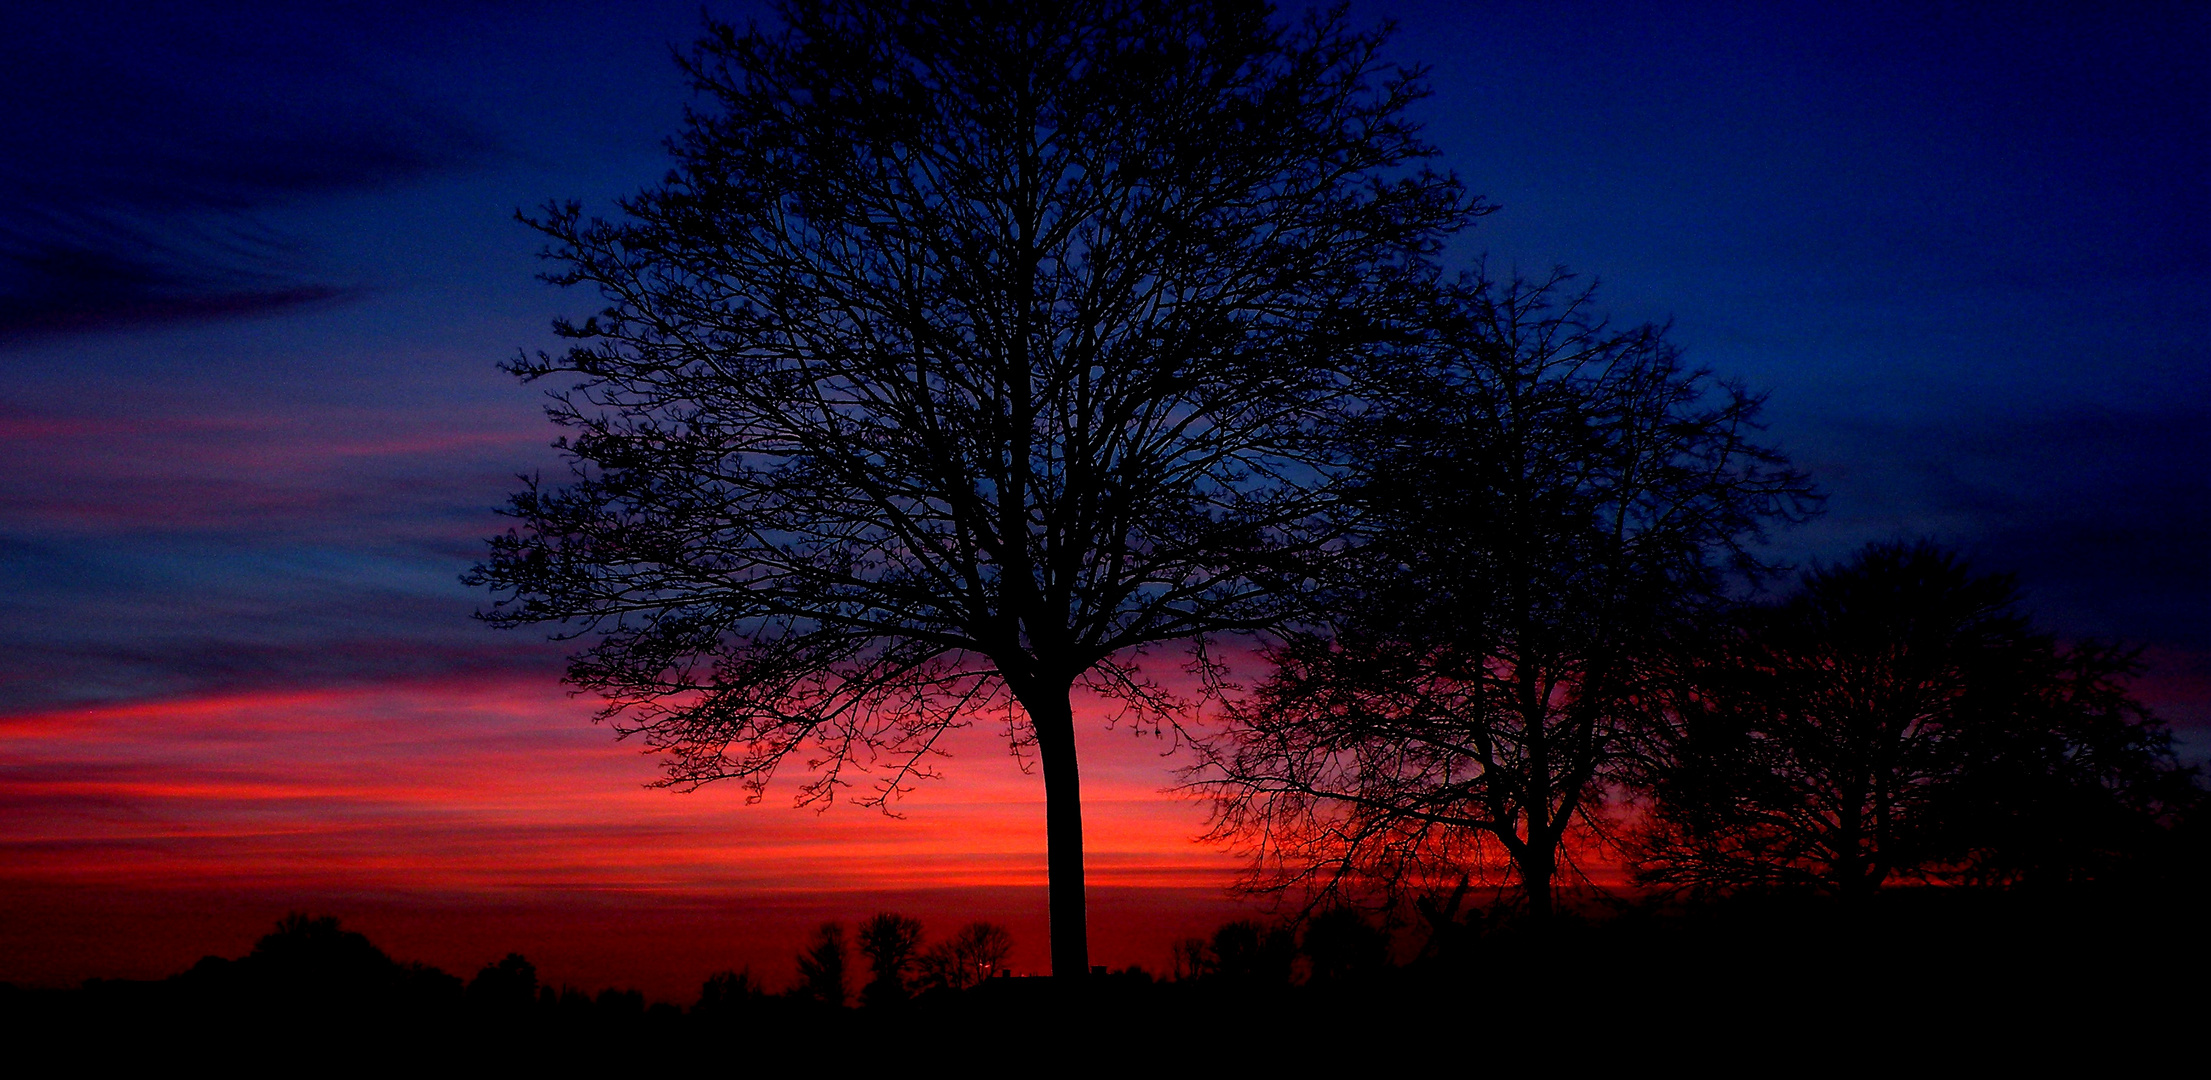 Sonnenuntergang Reitbrook 24.02.2014